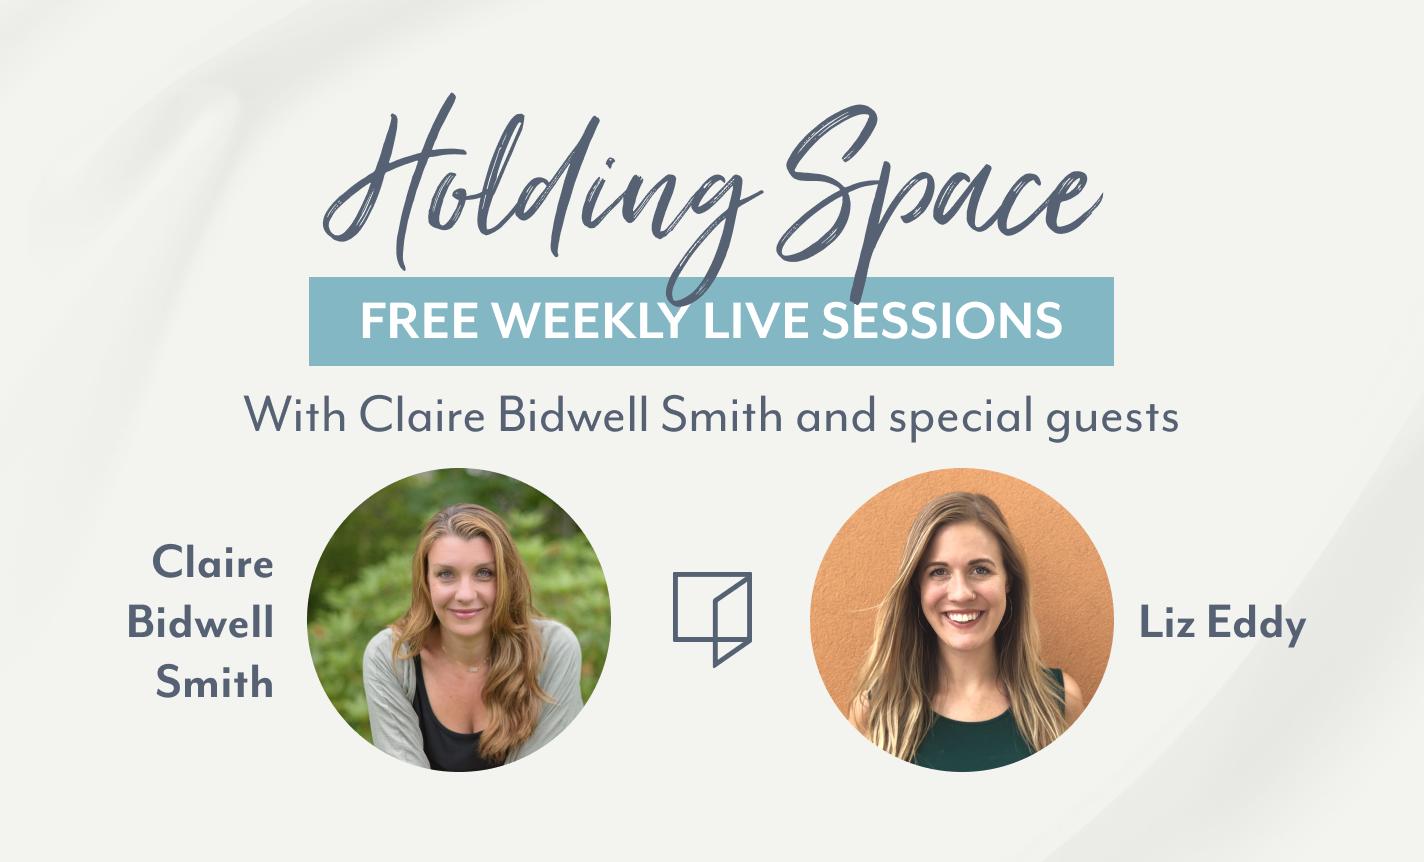 Holding Space: Claire Bidwell Smith & Liz Eddy